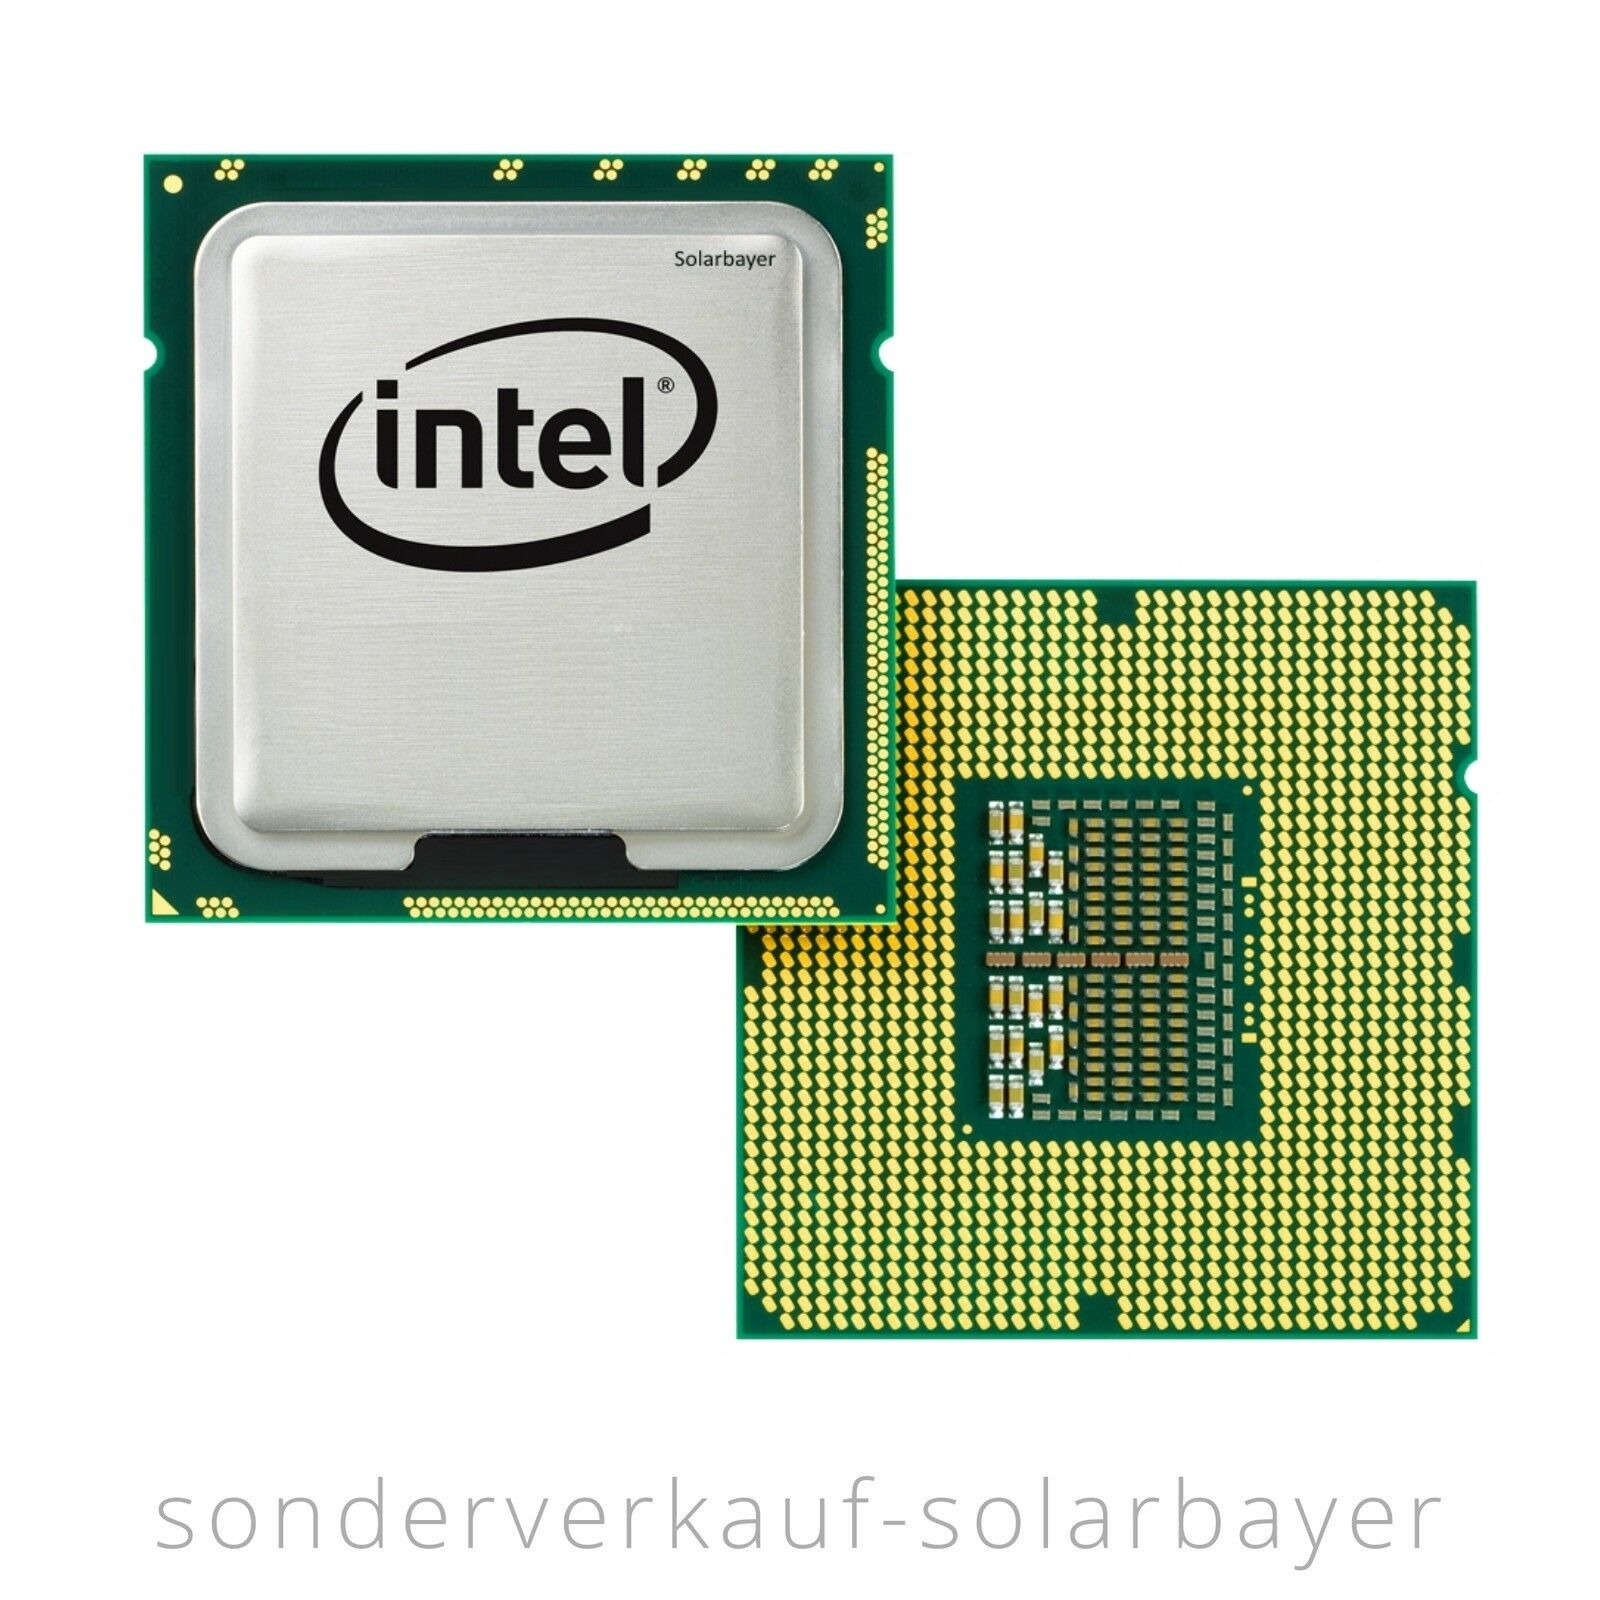 Intel Xeon W3680 X5690 X5680 X5675 X5670 X5660 X5650 E5649 X5687 X5672 X5647 i7